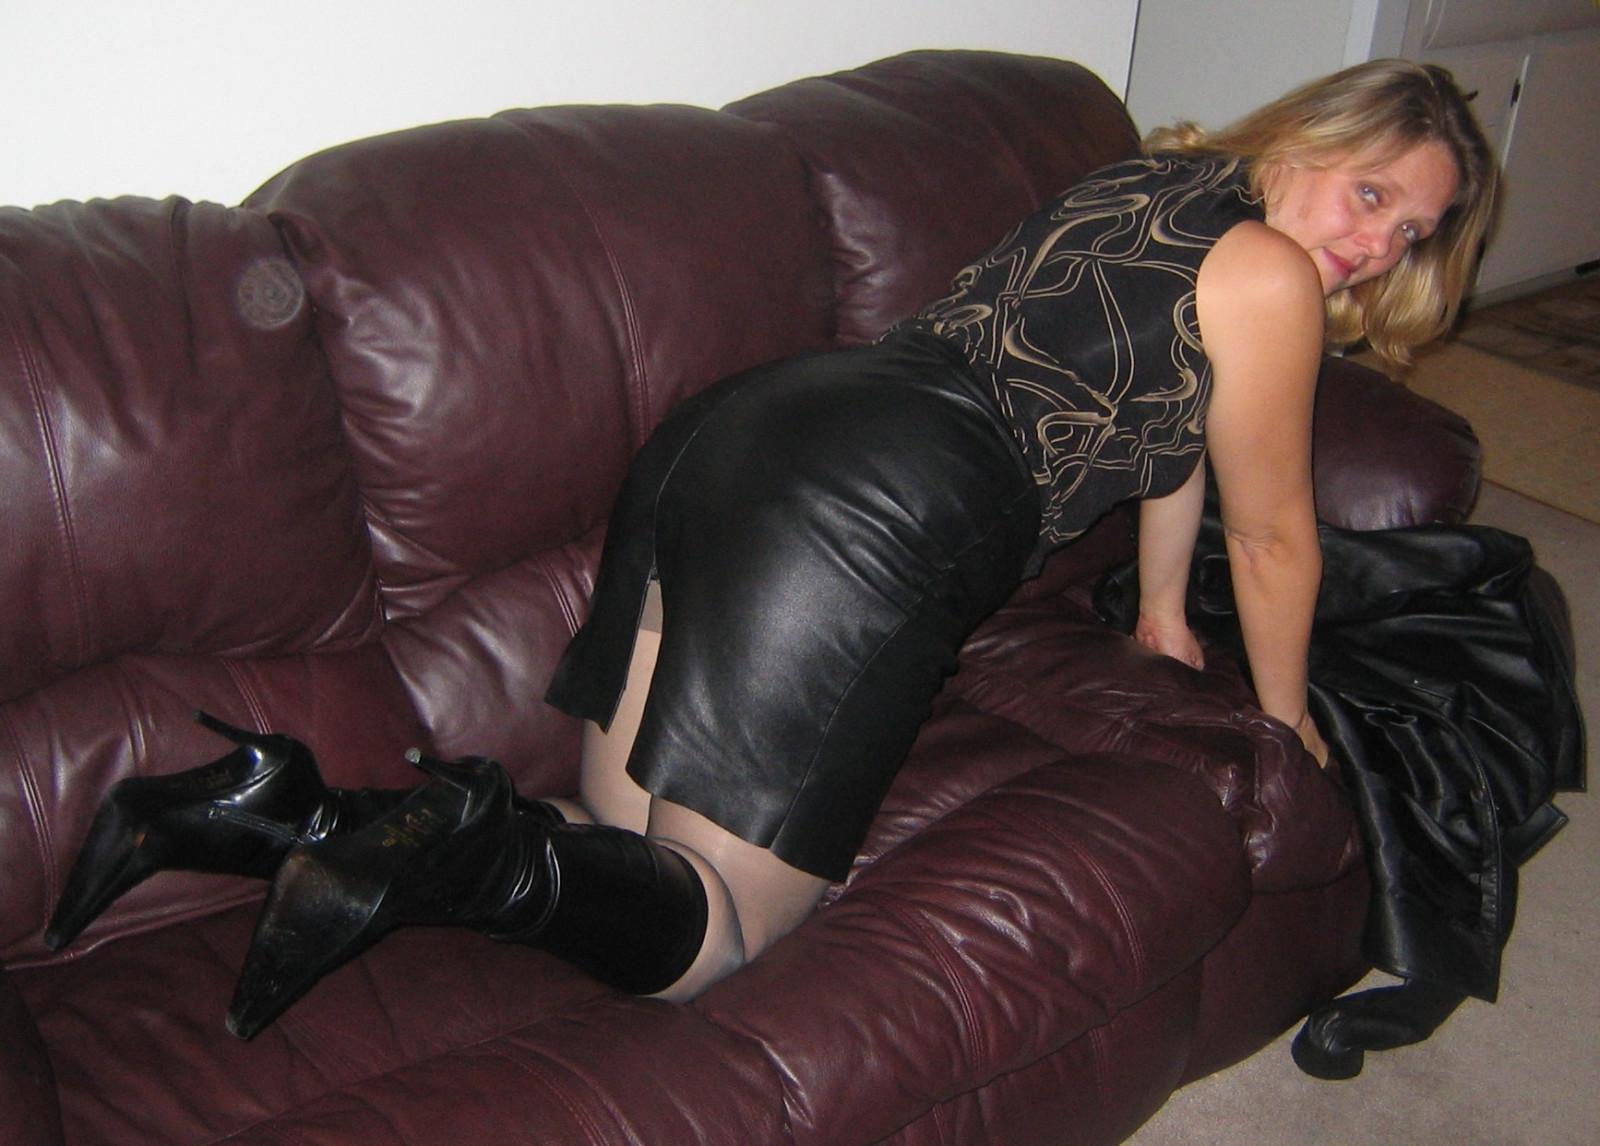 Ozadje Blonde, Ass, črni lasje, usta, škornji-9986